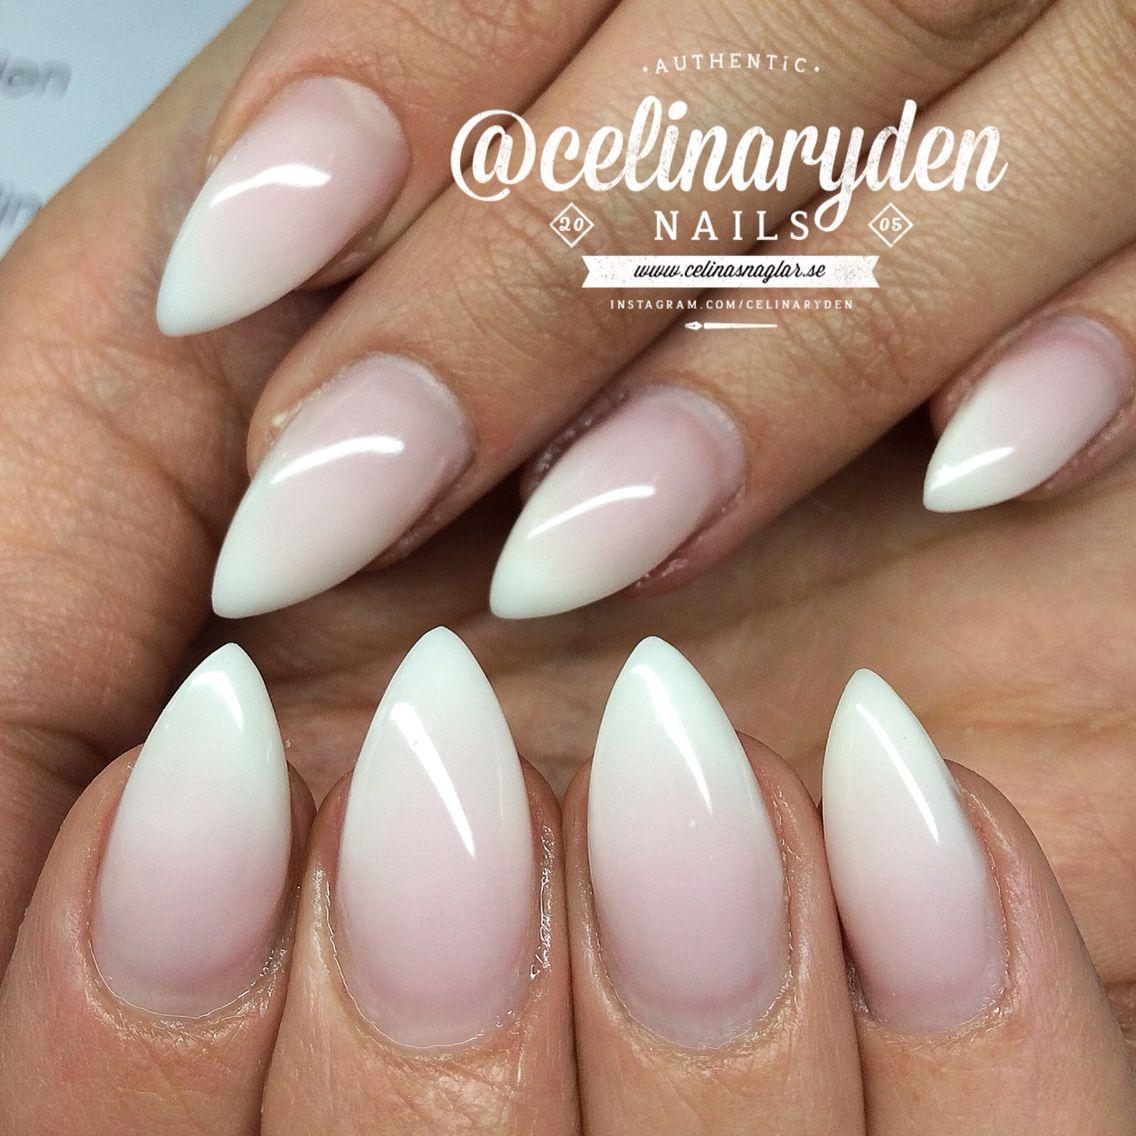 Ombre (babyboomer) nail designe | Salon nails by me | Pinterest ...